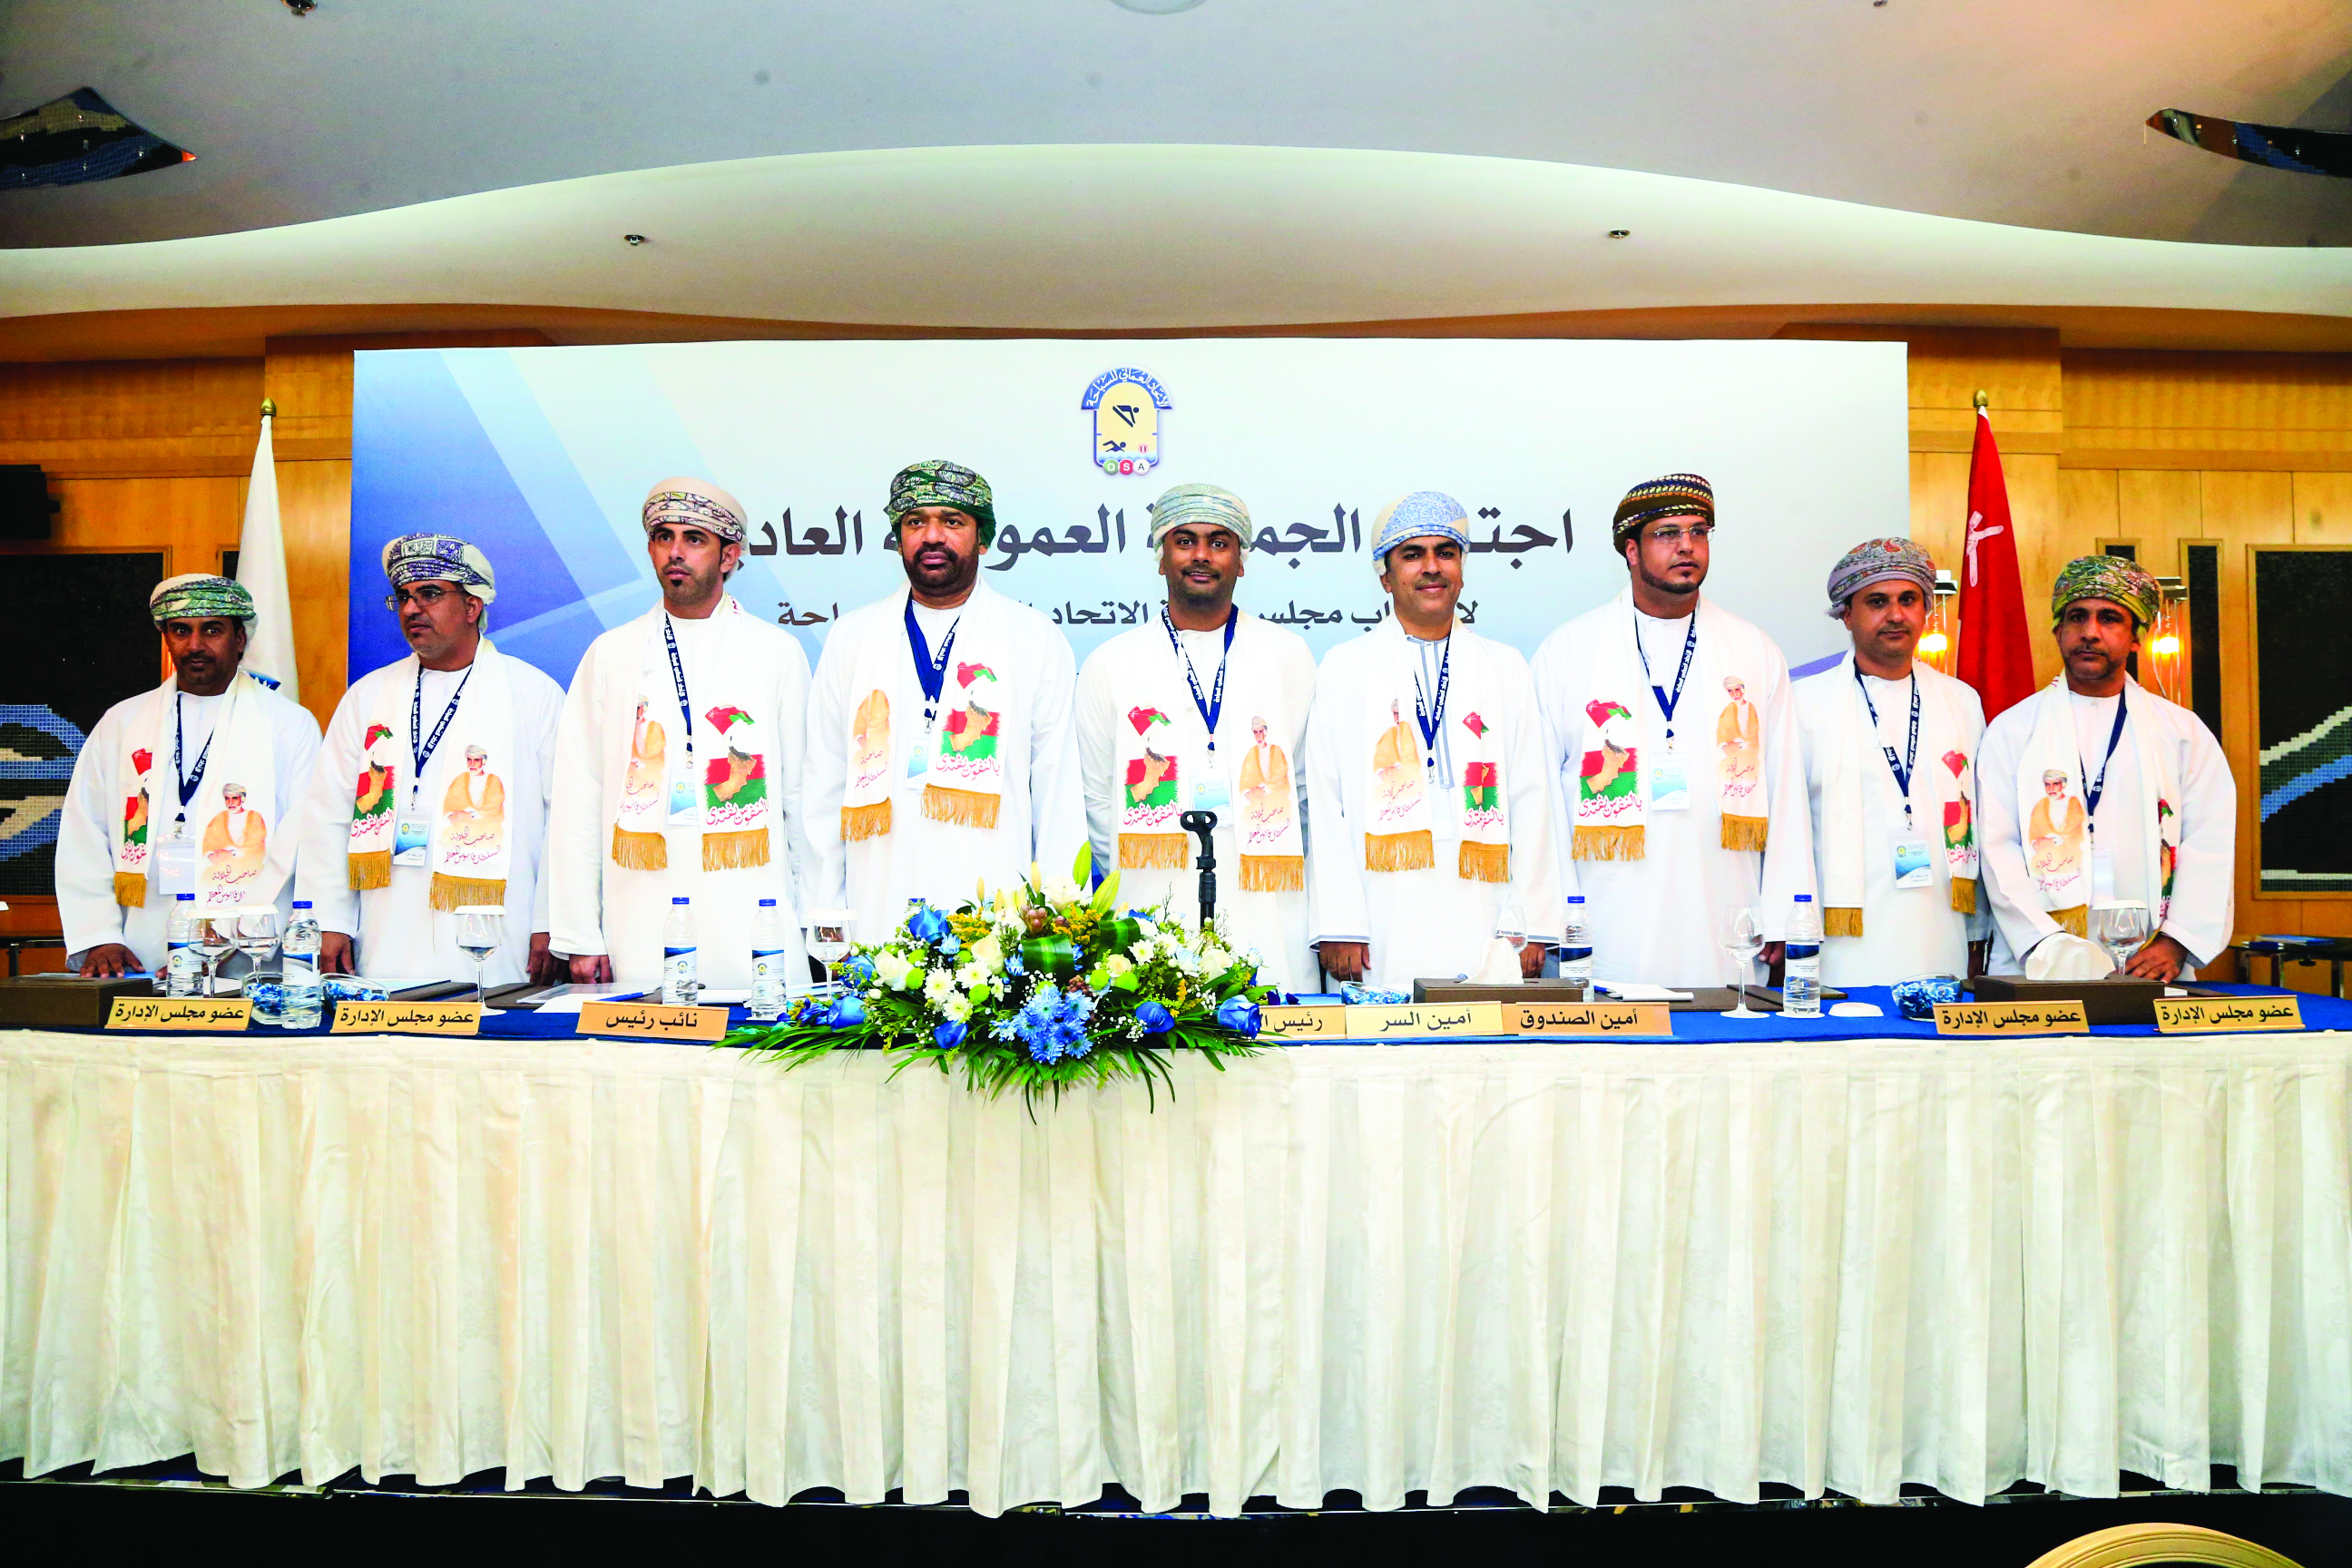 Taha Al Kishry re-elected as Oman Swimming Association chairman